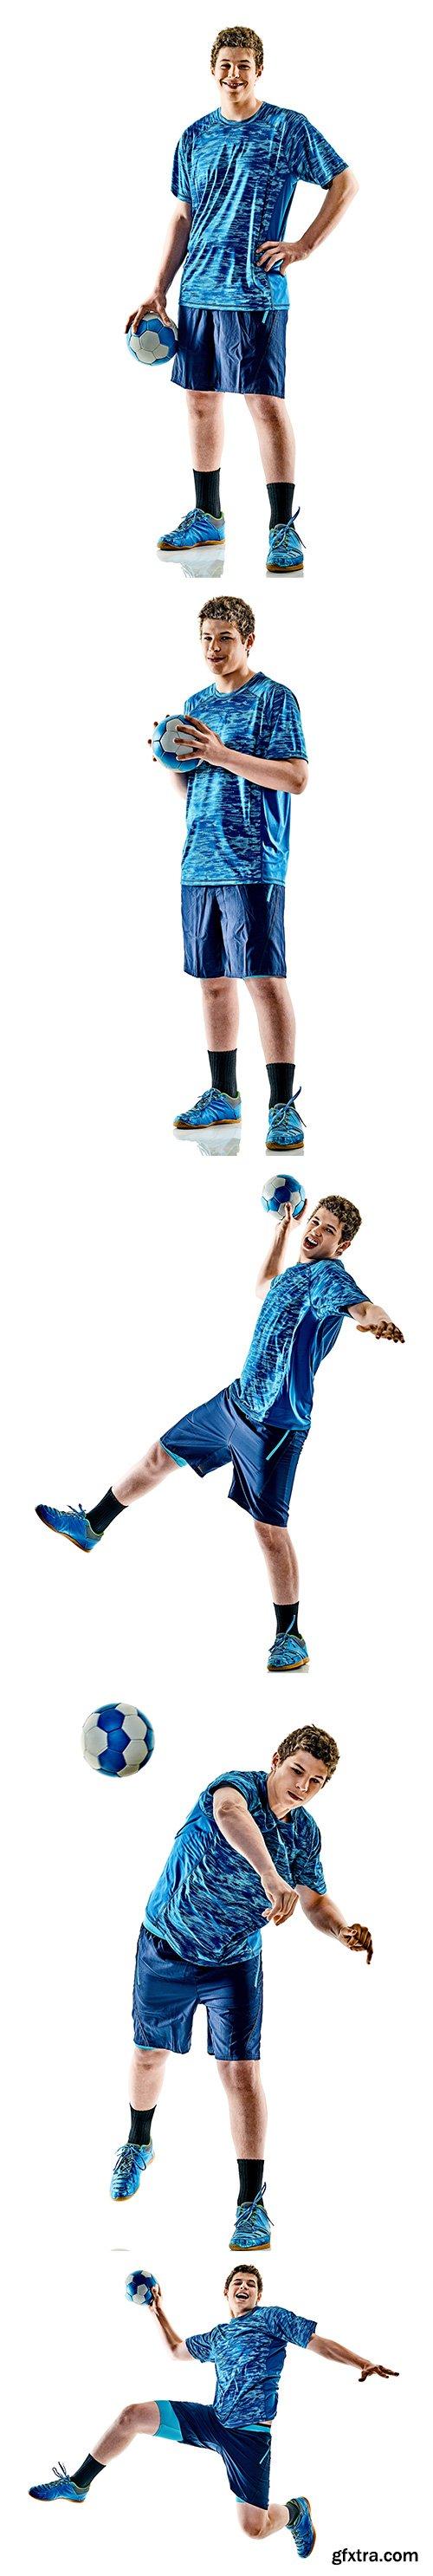 Handball Player Isolated  - 9xJPGs